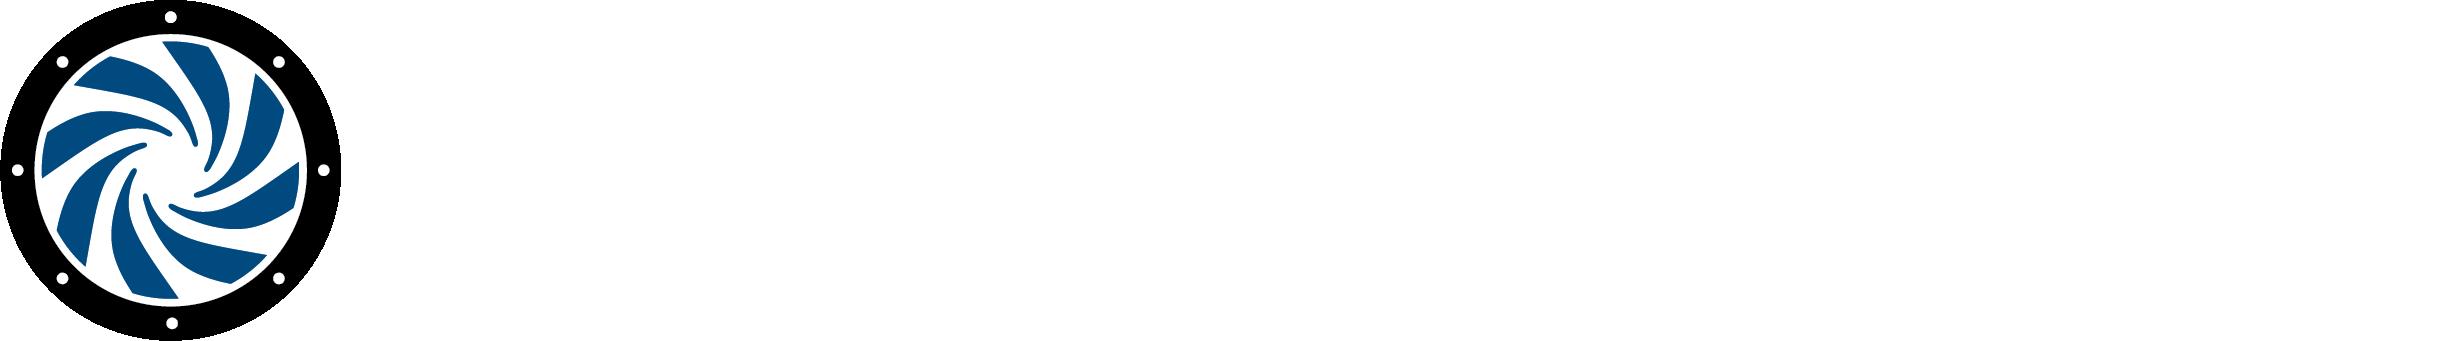 Pipeline Control & Services